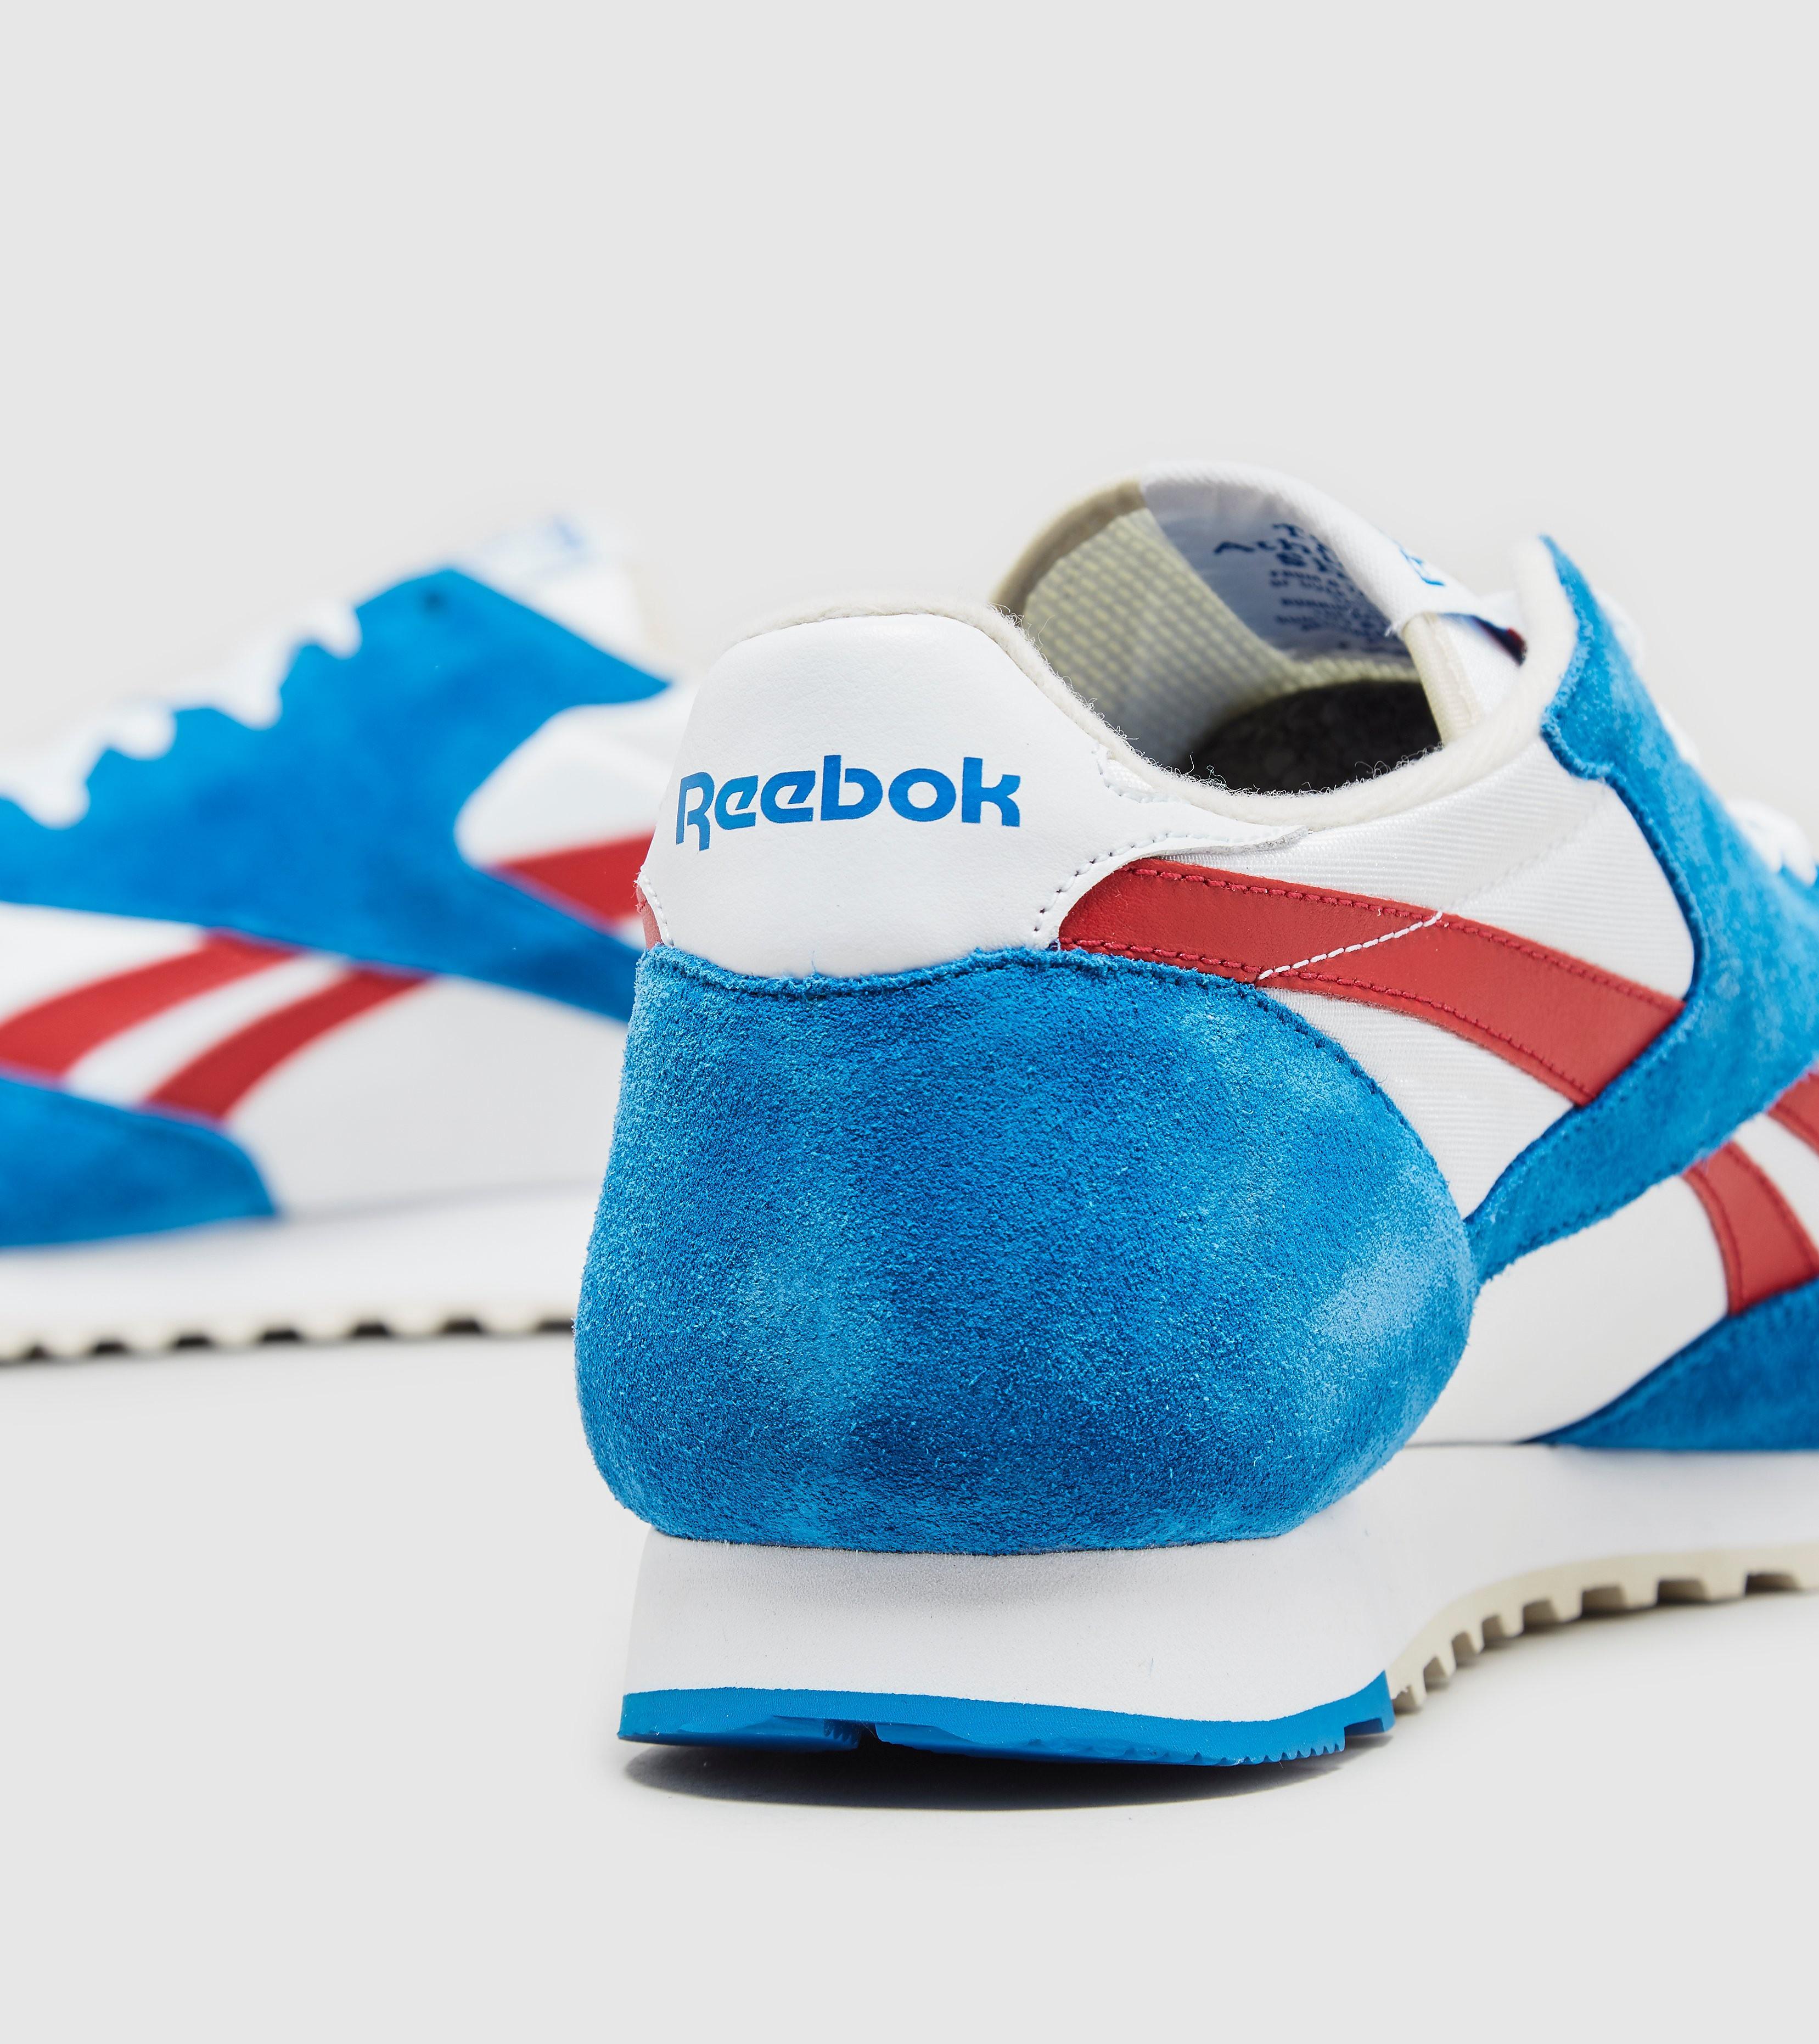 Reebok Paris Runner